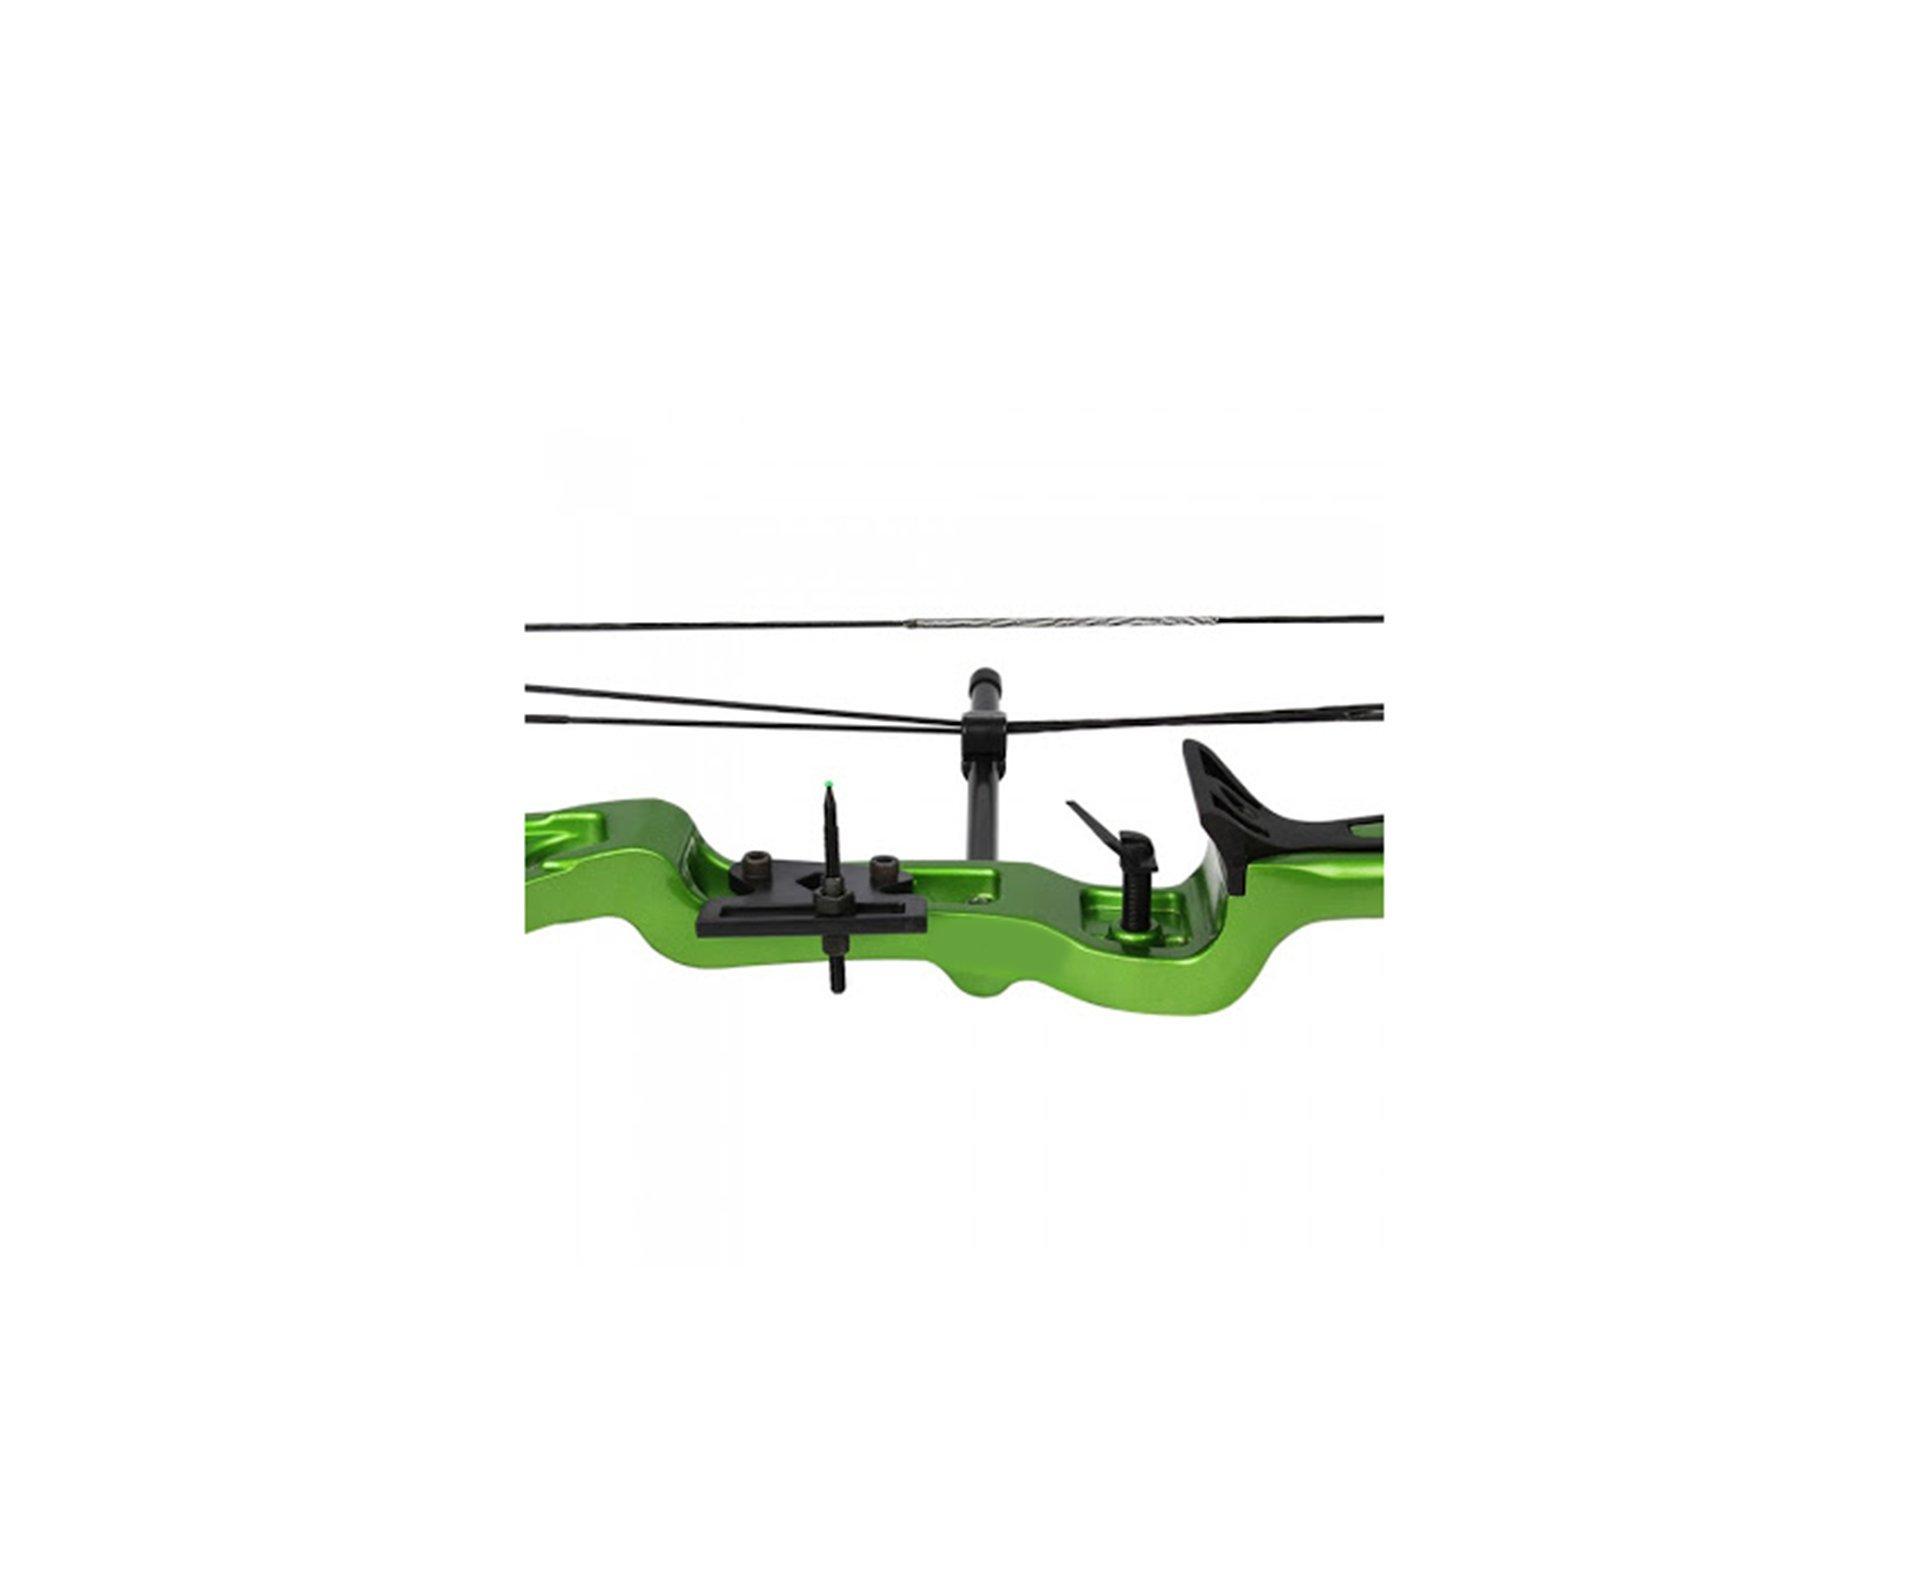 Arco Composto 30-55 Lbs Verde Mk-cb50g - Man Kung